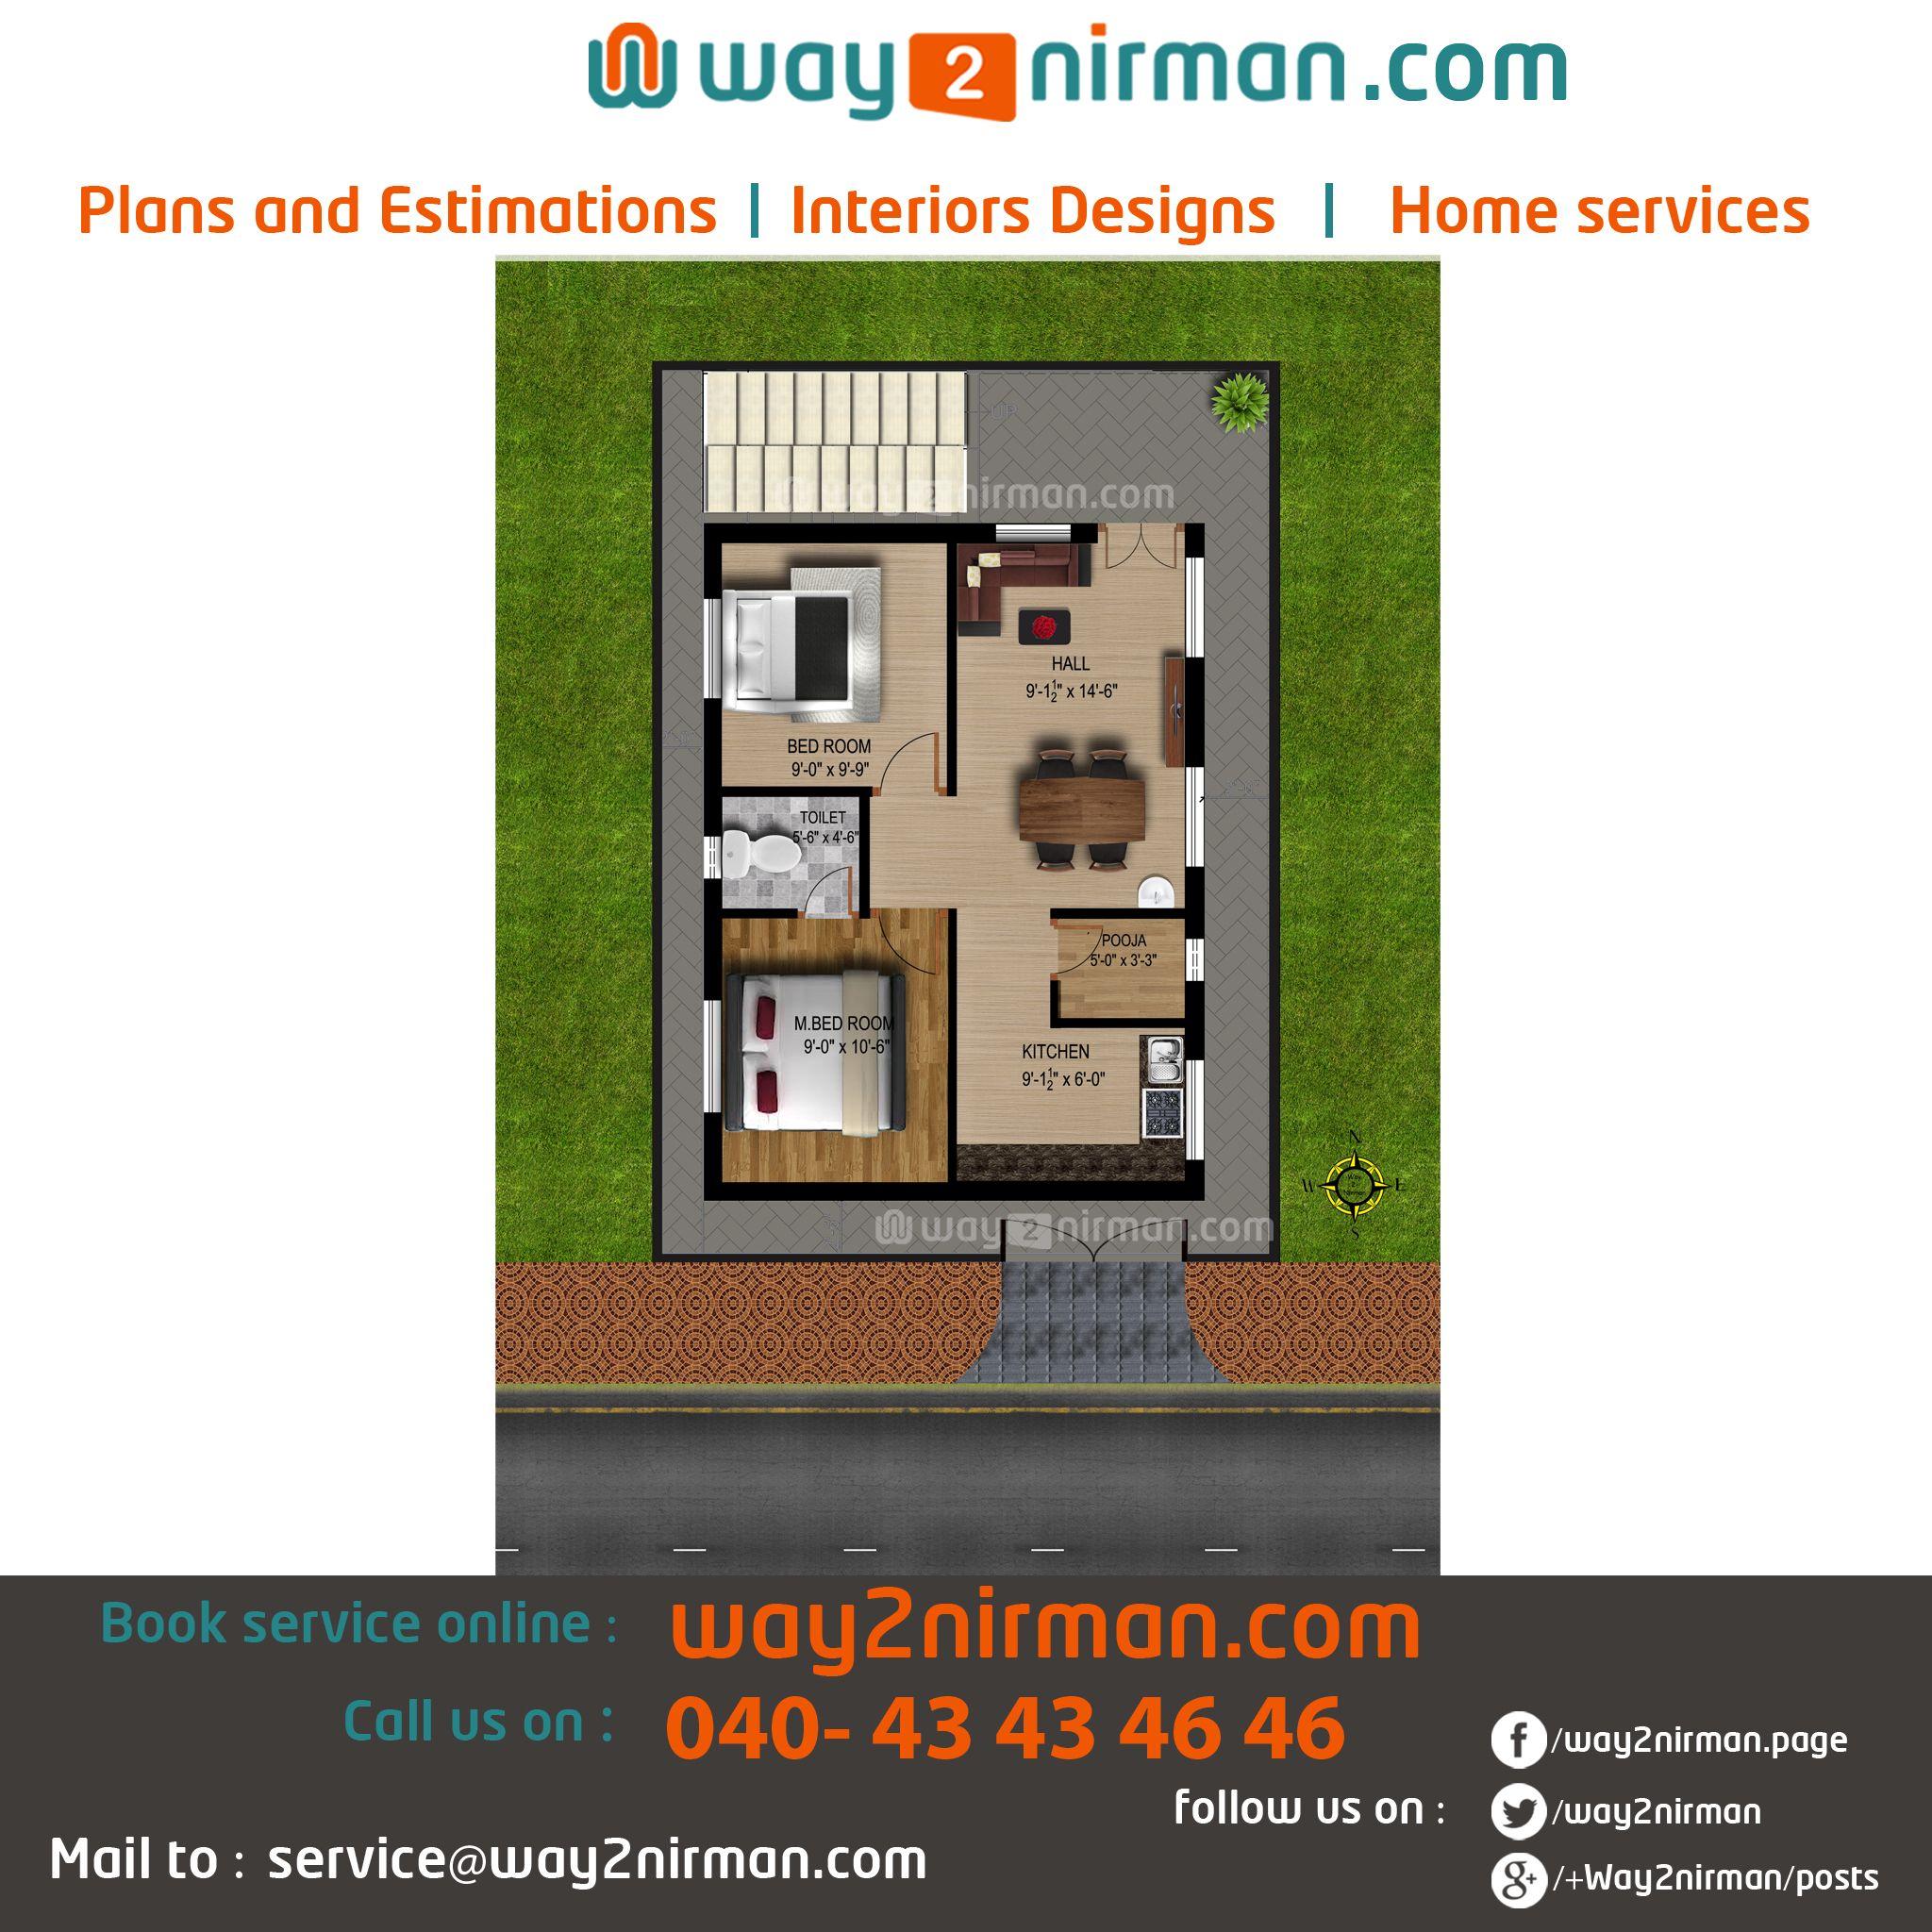 Building Plans, House Plans, Architects, Buildings, Blueprints For Homes,  Architecture Drawing Plan, Building Homes, House Floor Plans, House Design